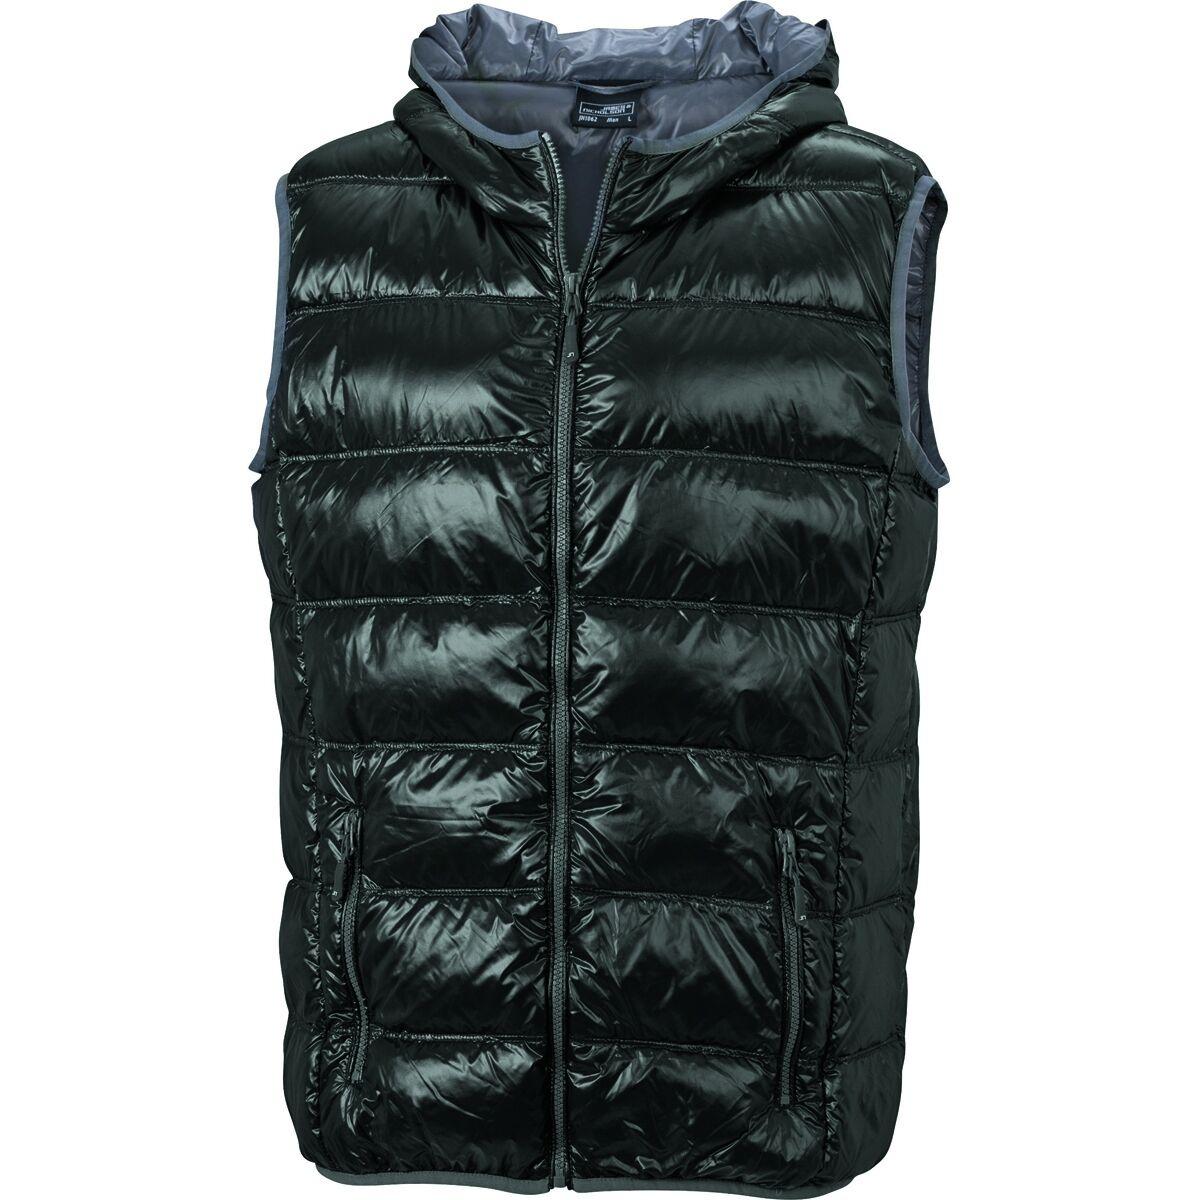 Bodywarmer duvet doudoune sans manches anorak homme - JN1062 - noir